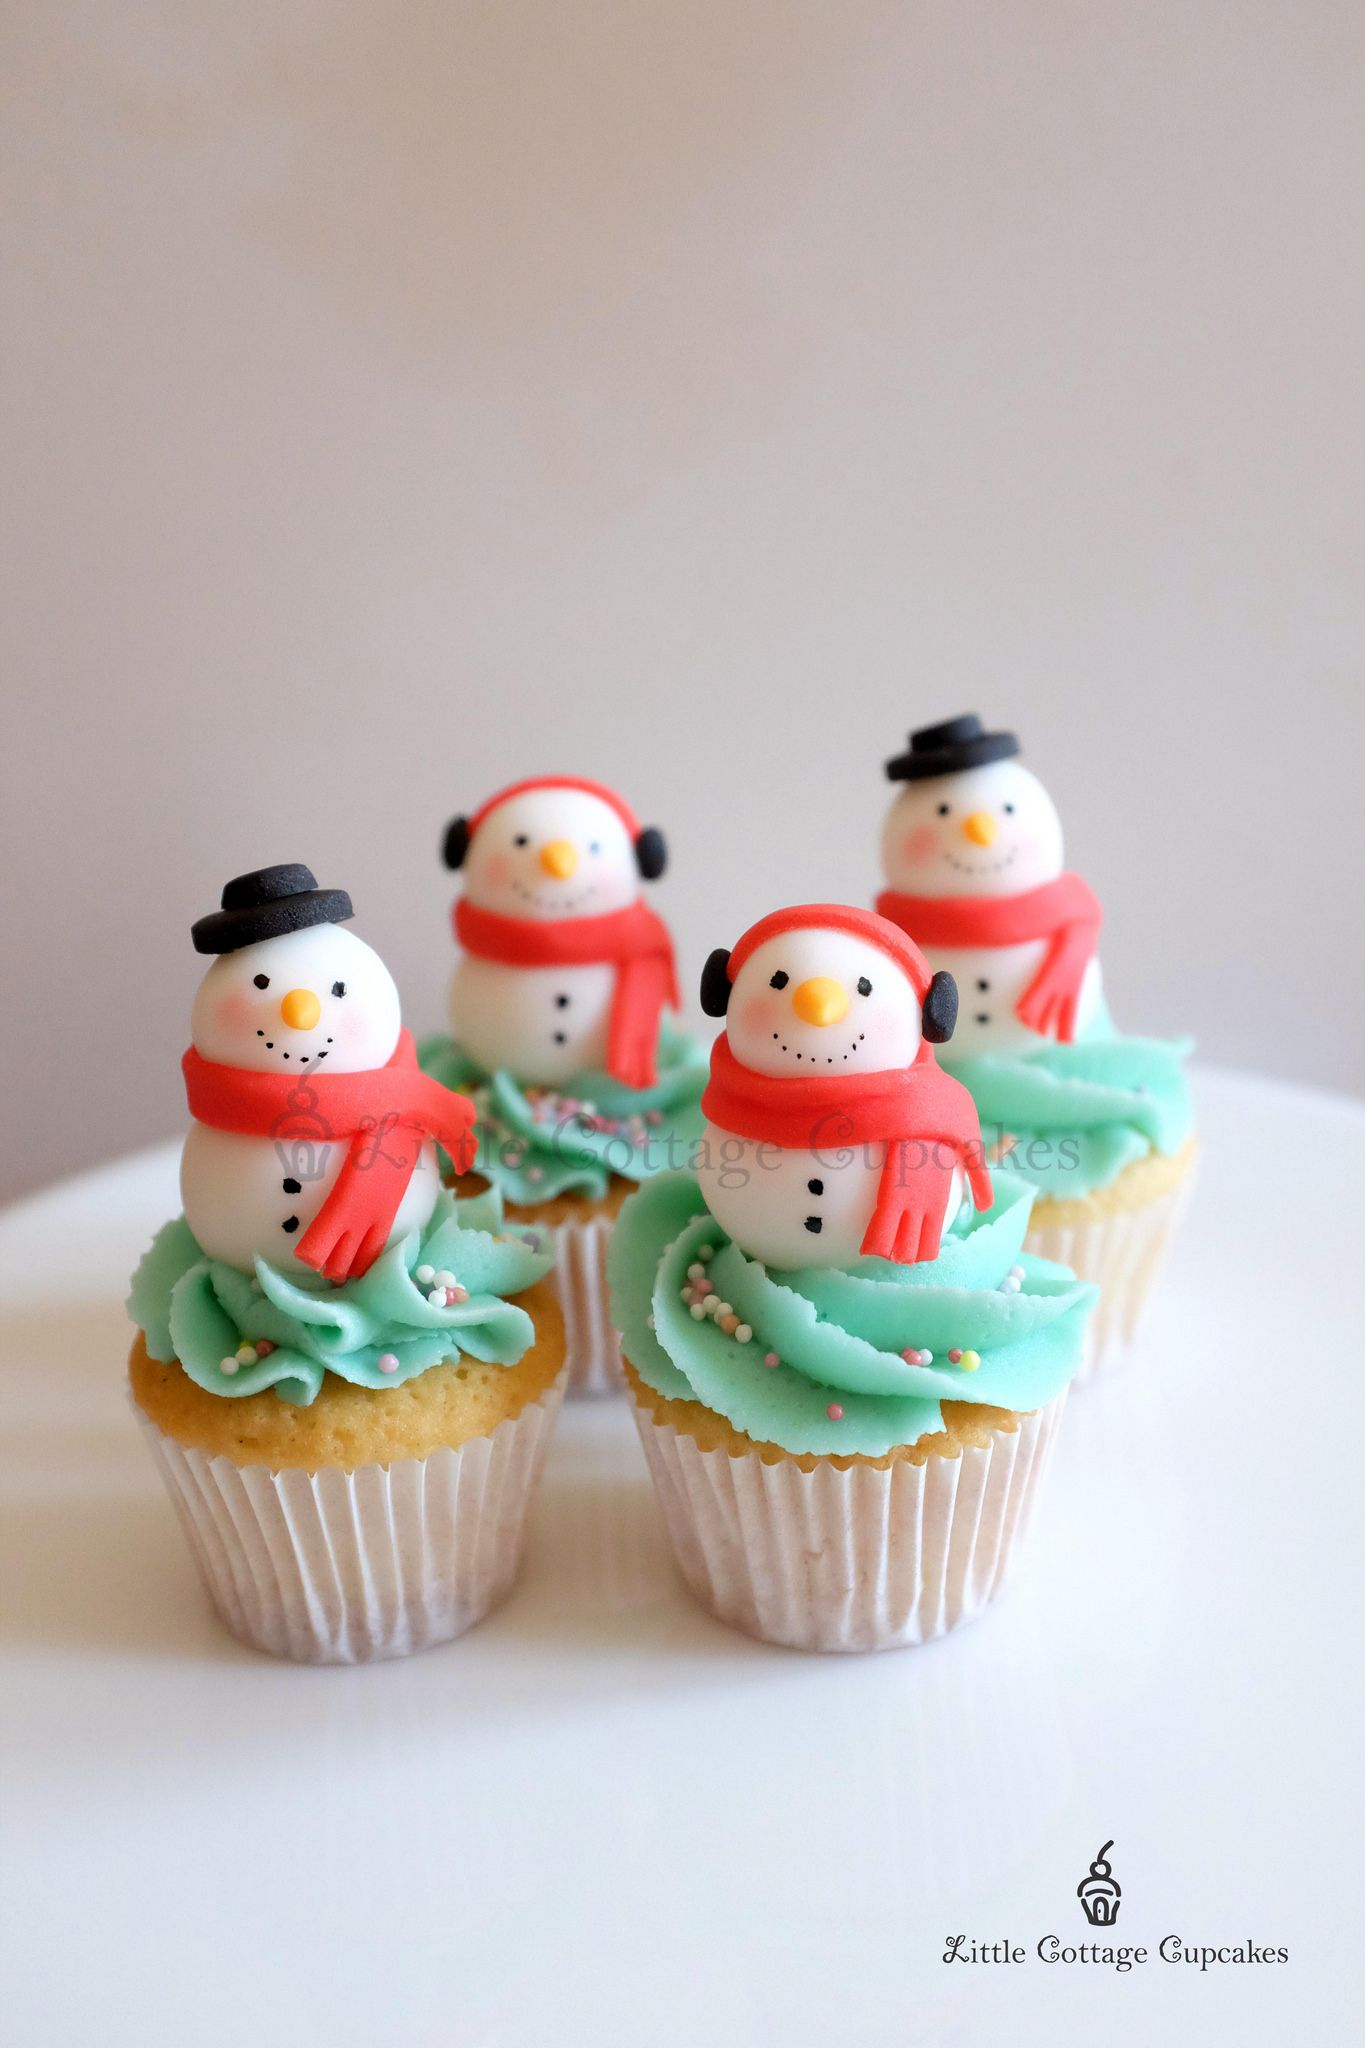 https://flic.kr/p/qtziUP | Snowmen! | Mini Christmas Cupcakes for my daughter's class party.